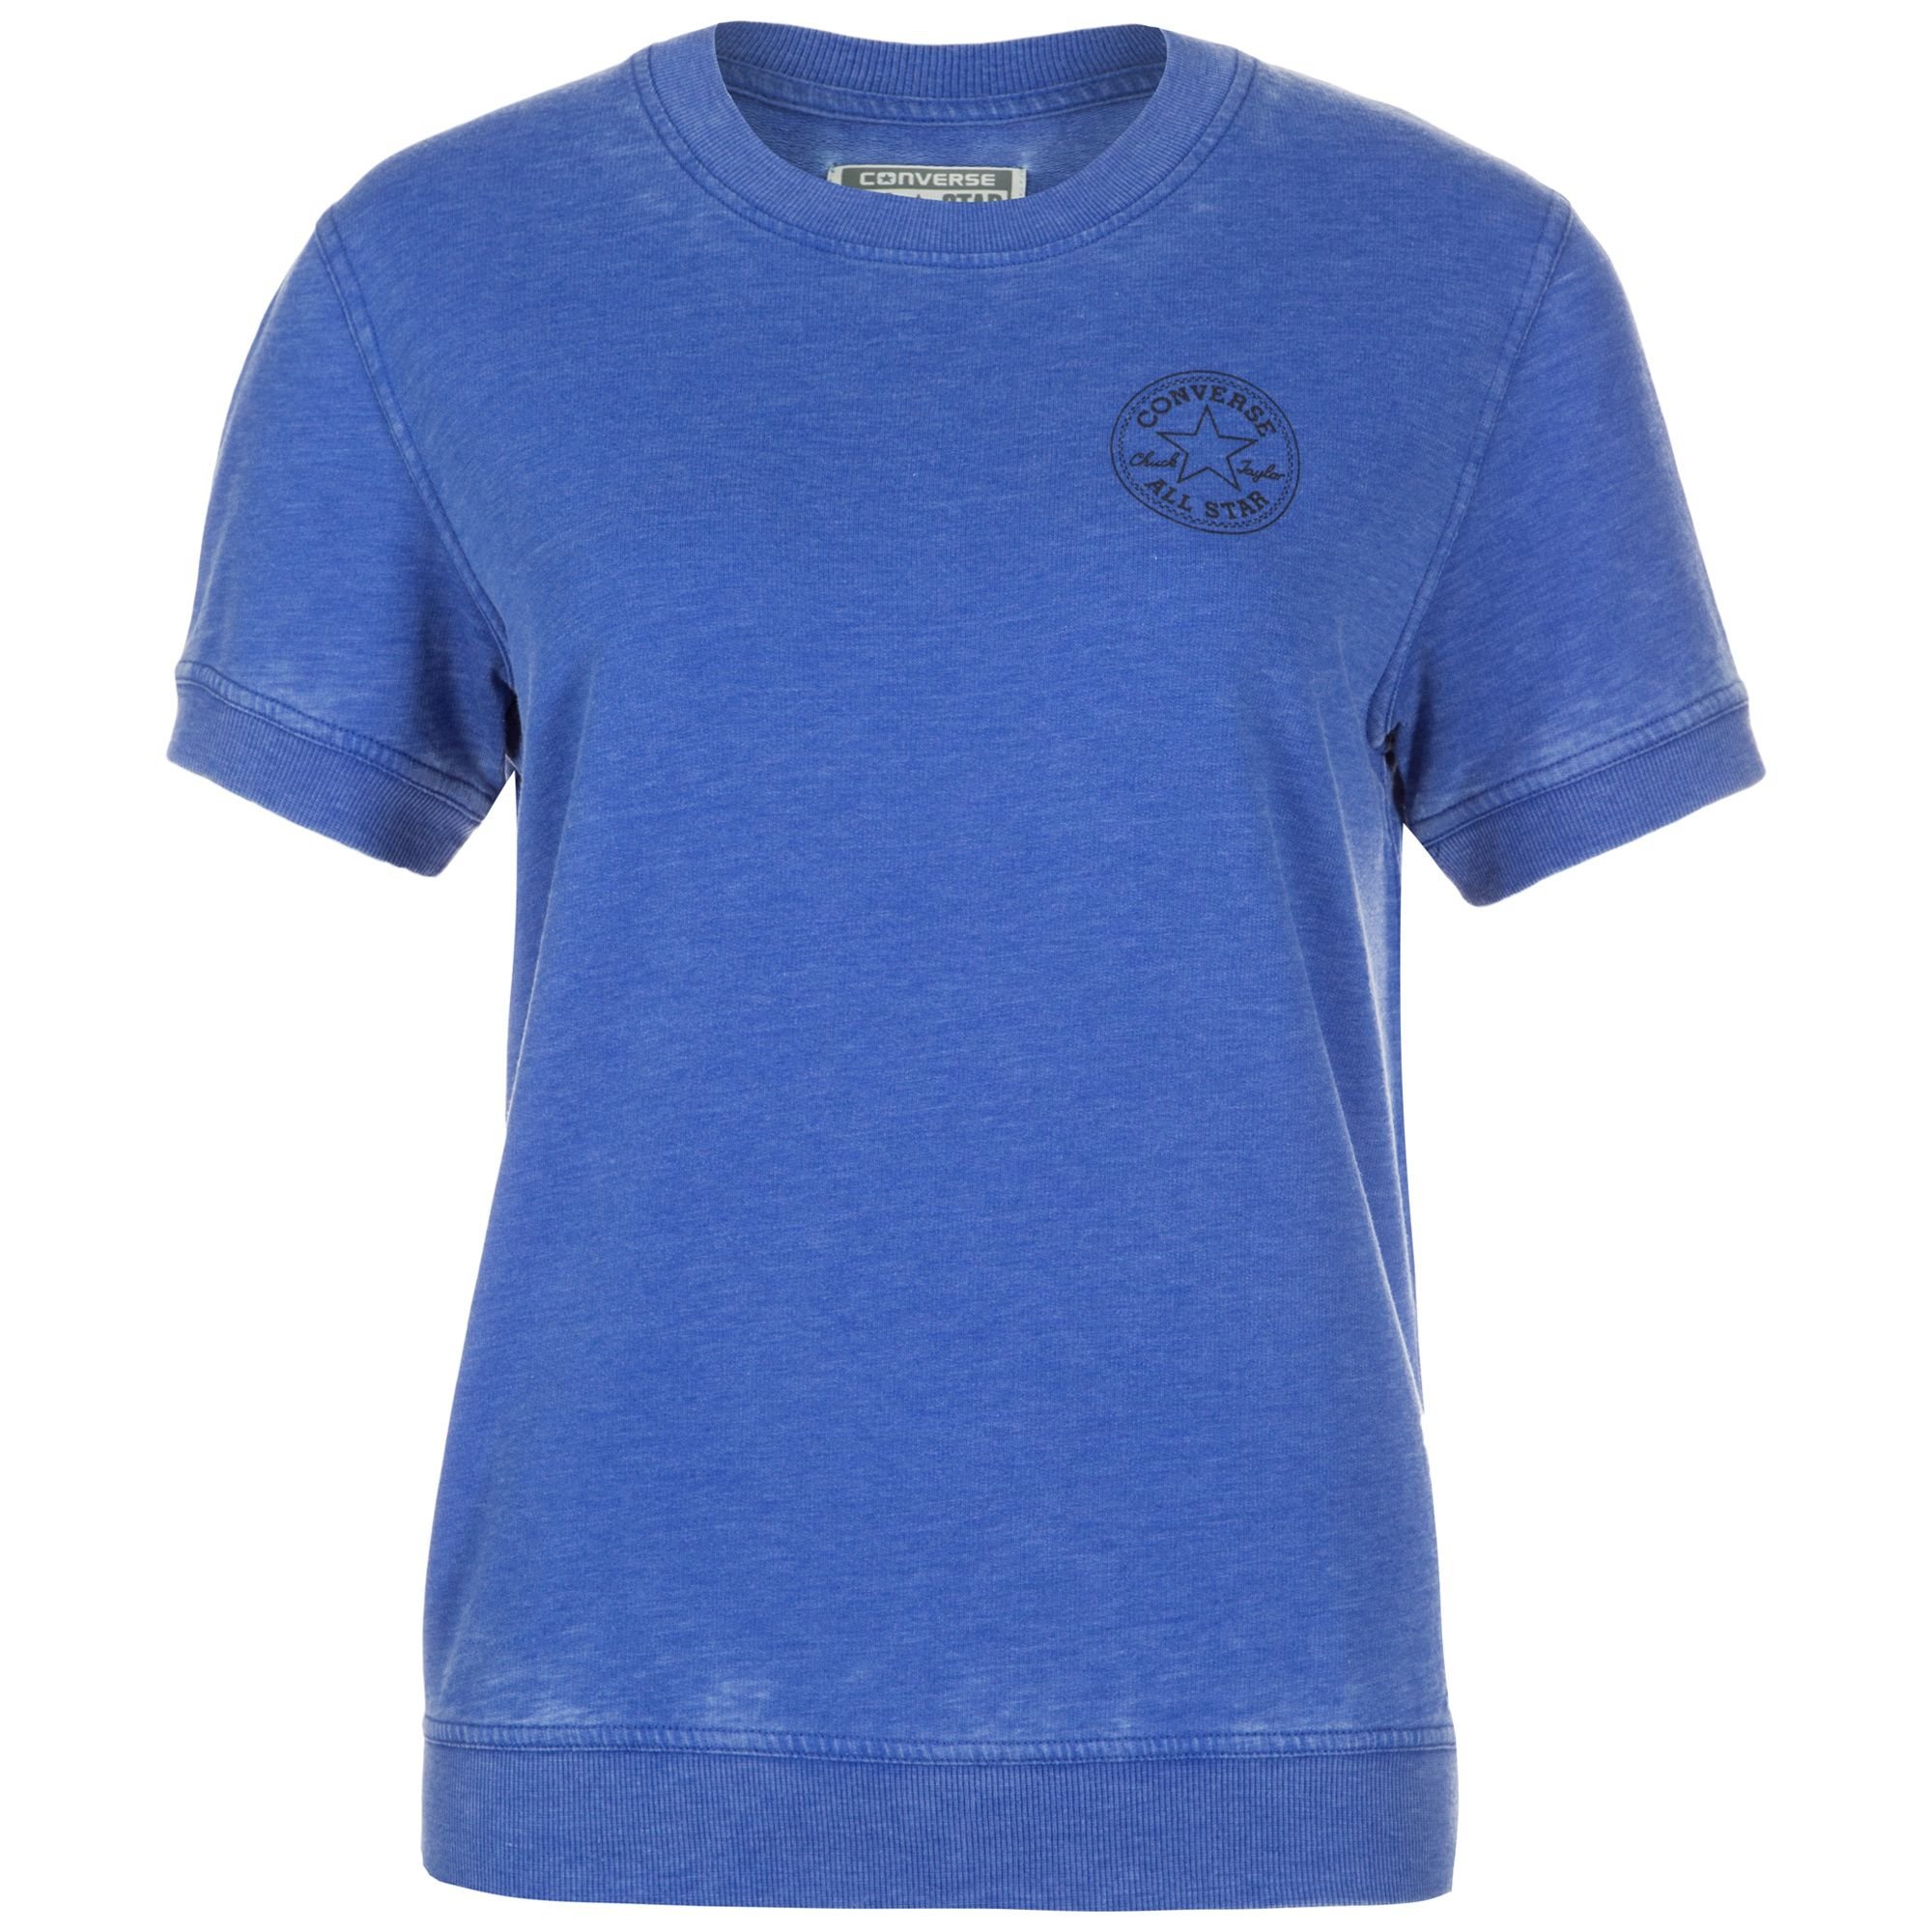 CONVERSE Converse Burnout T-Shirt Damen